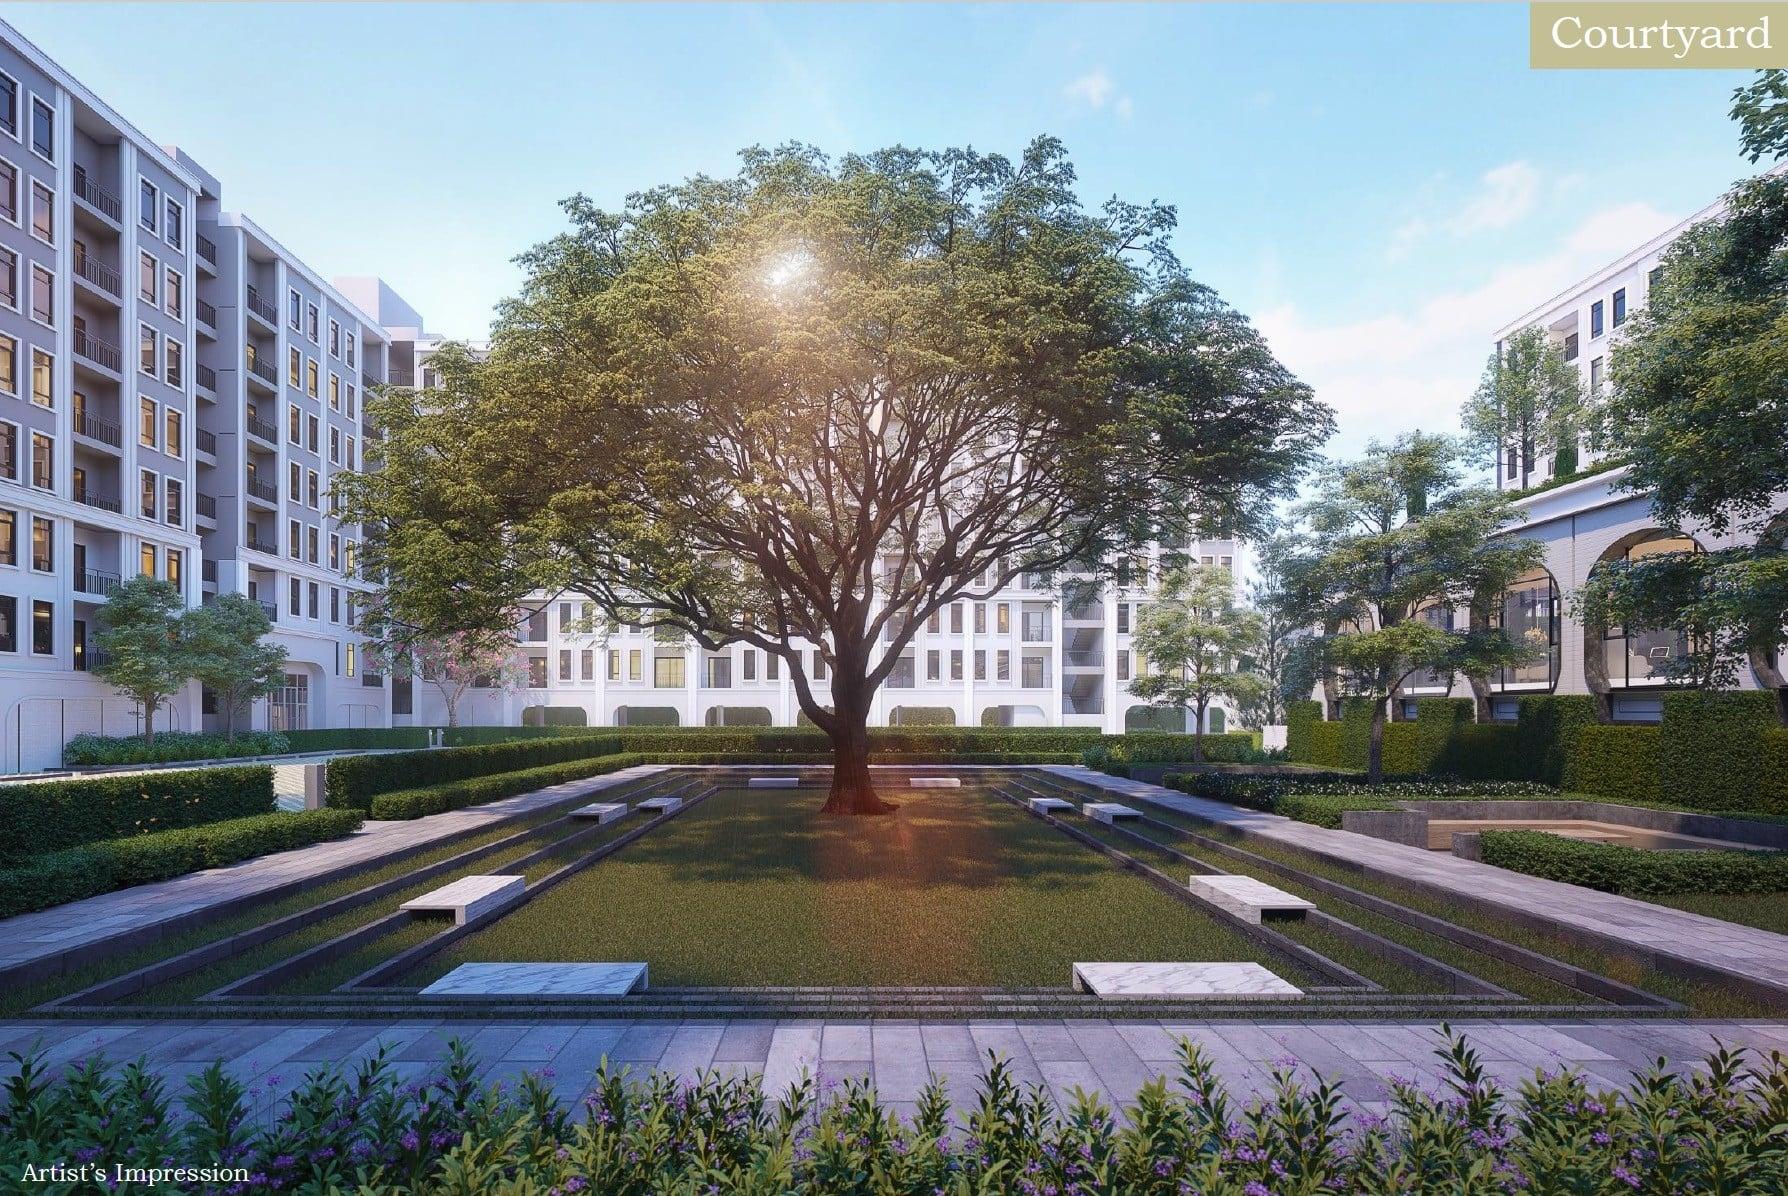 Aspire-Asoke-Ratchada-Courtyard-2